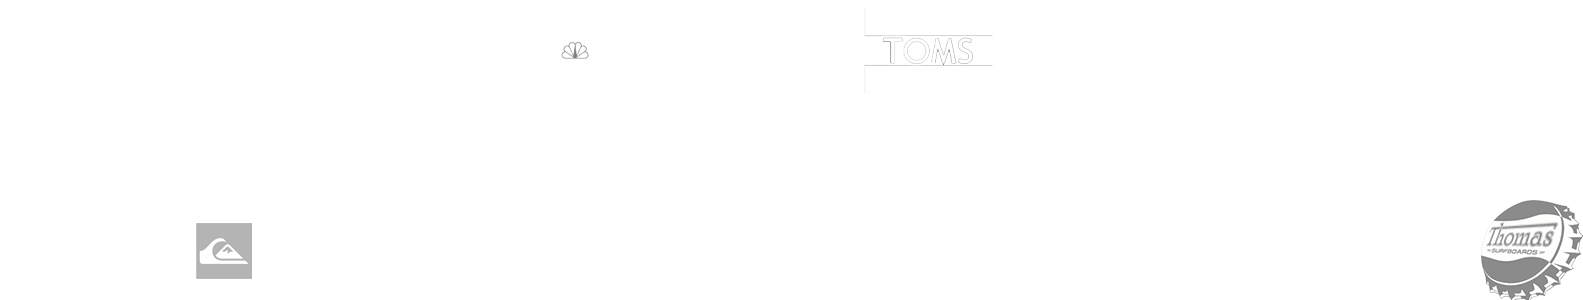 saturate studio logo